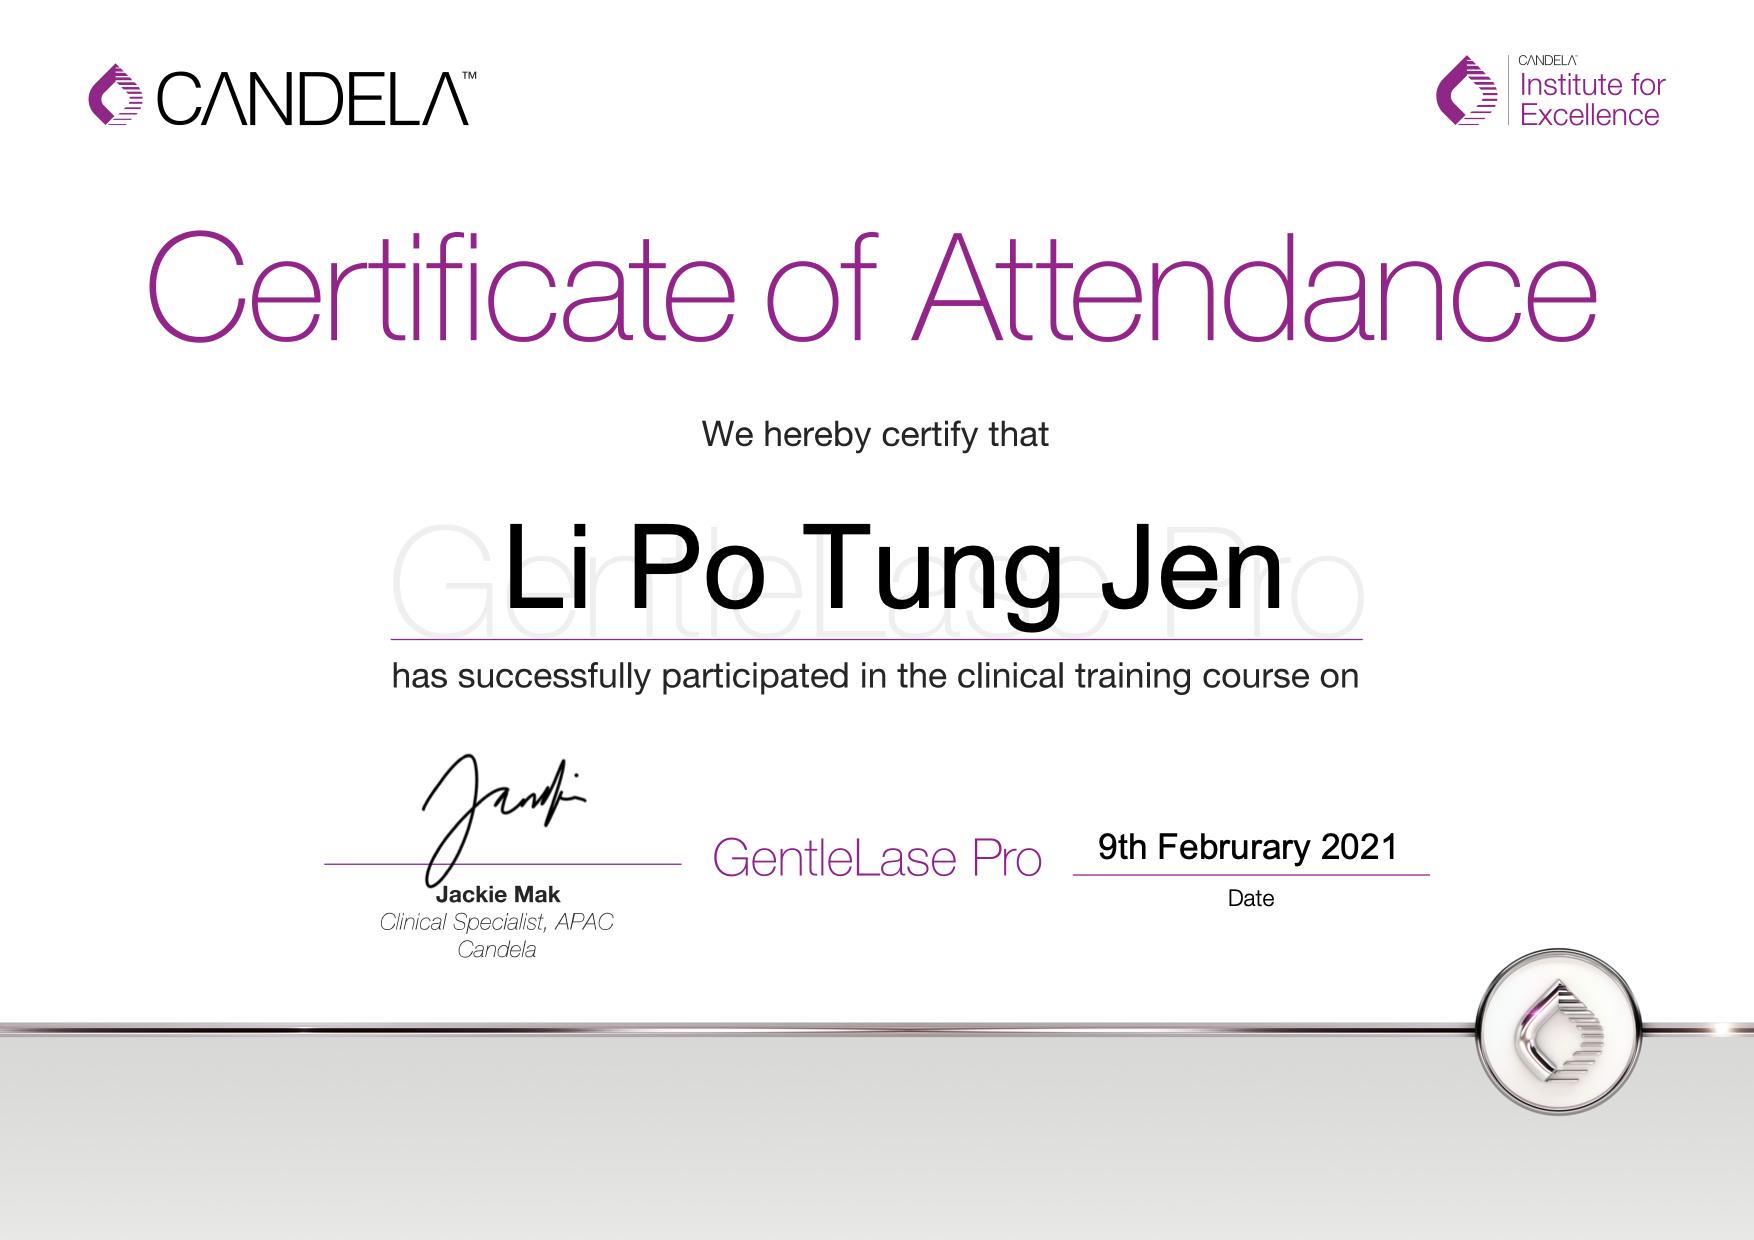 GentleLase_Pro_Certifcate_LiPoTungJenYanis